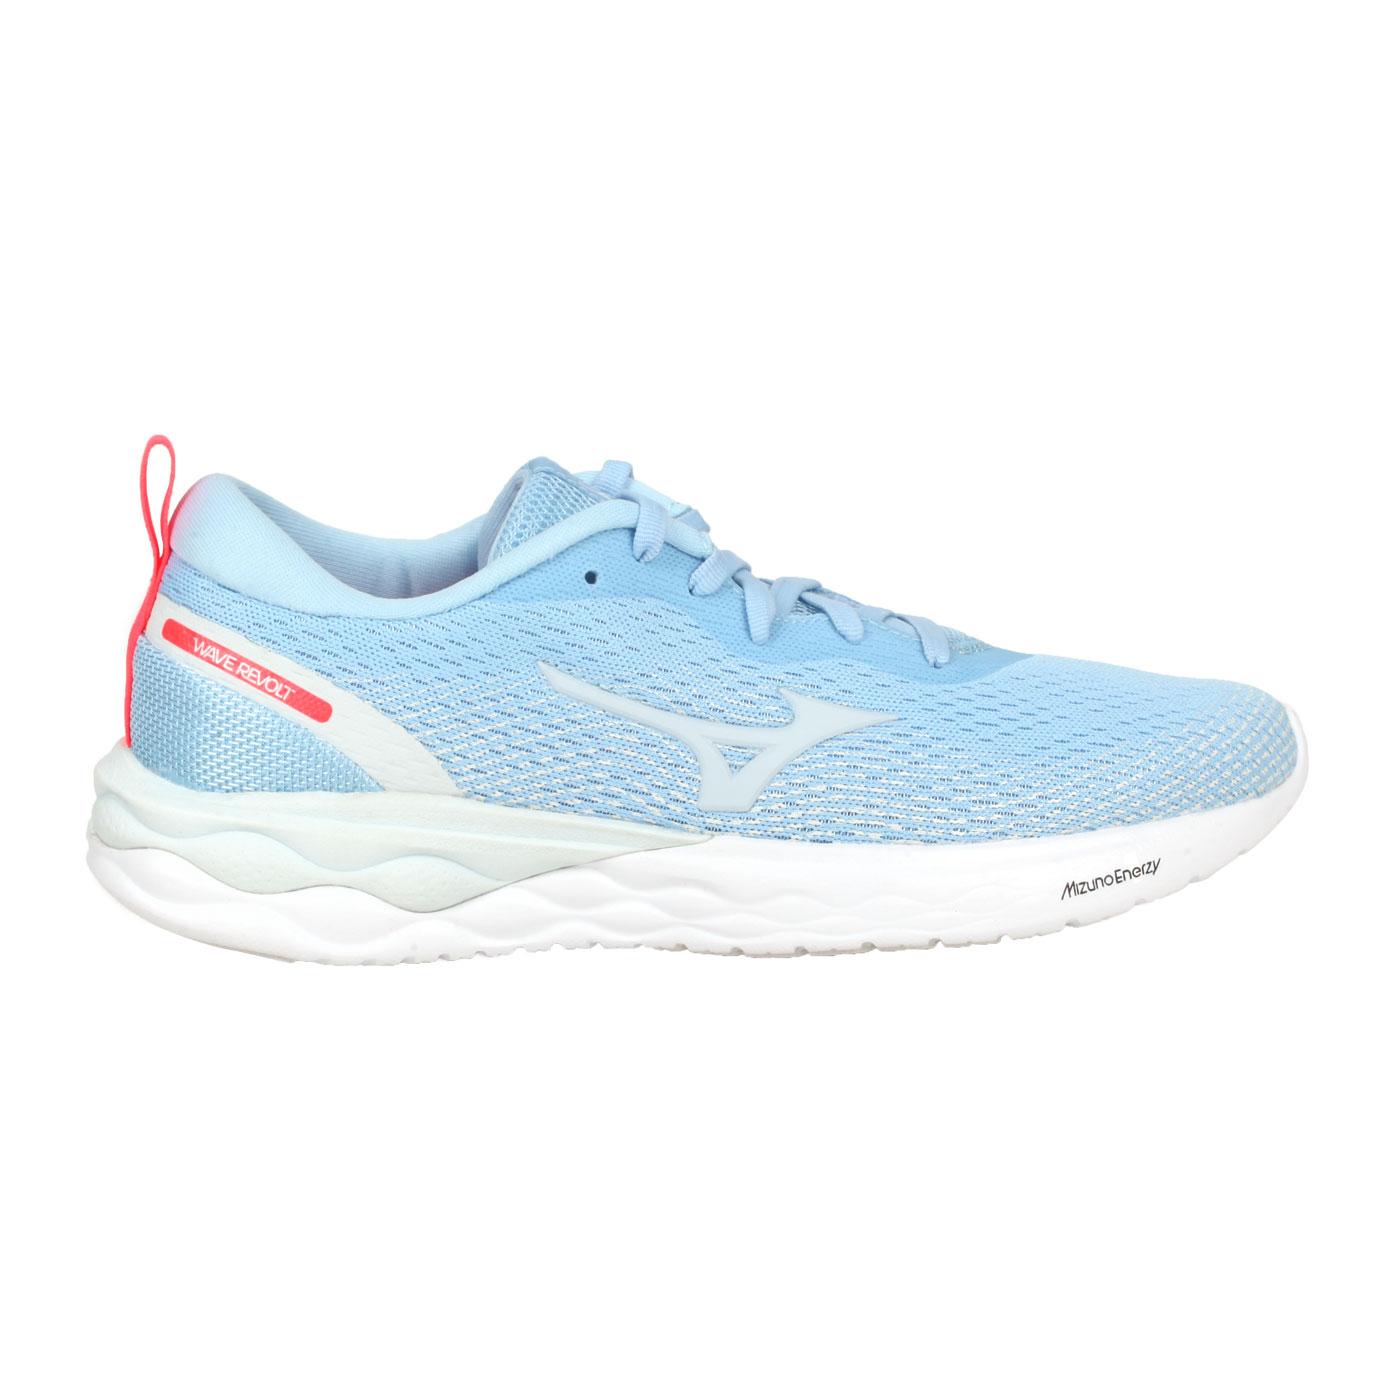 MIZUNO 女款慢跑鞋  @WAVE REVOLT@J1GD208125 - 粉藍灰亮紅